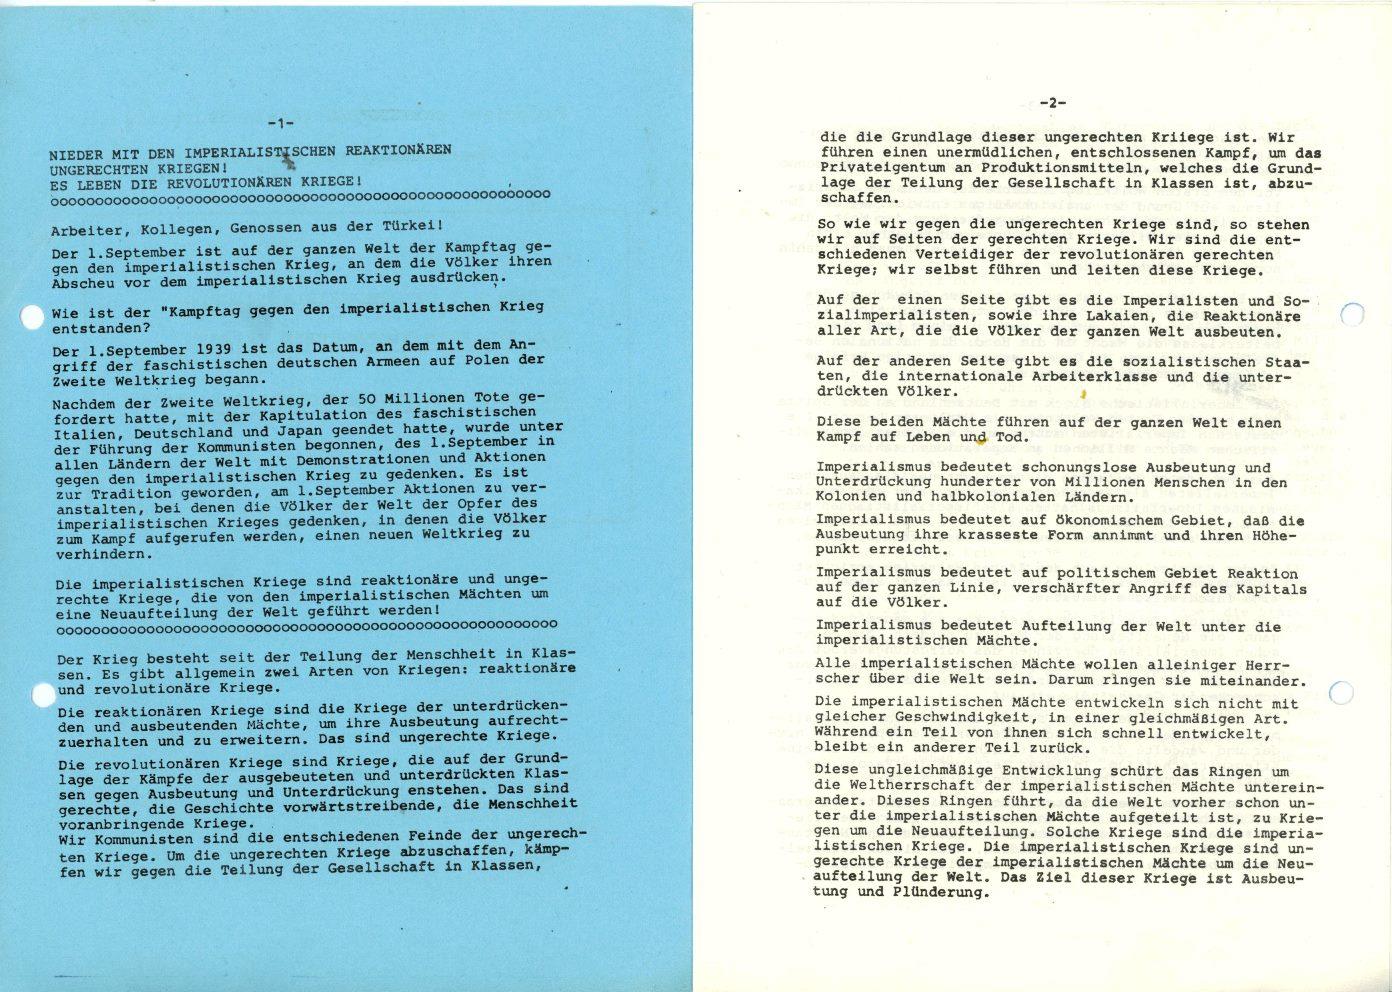 TKPML_1977_03_02